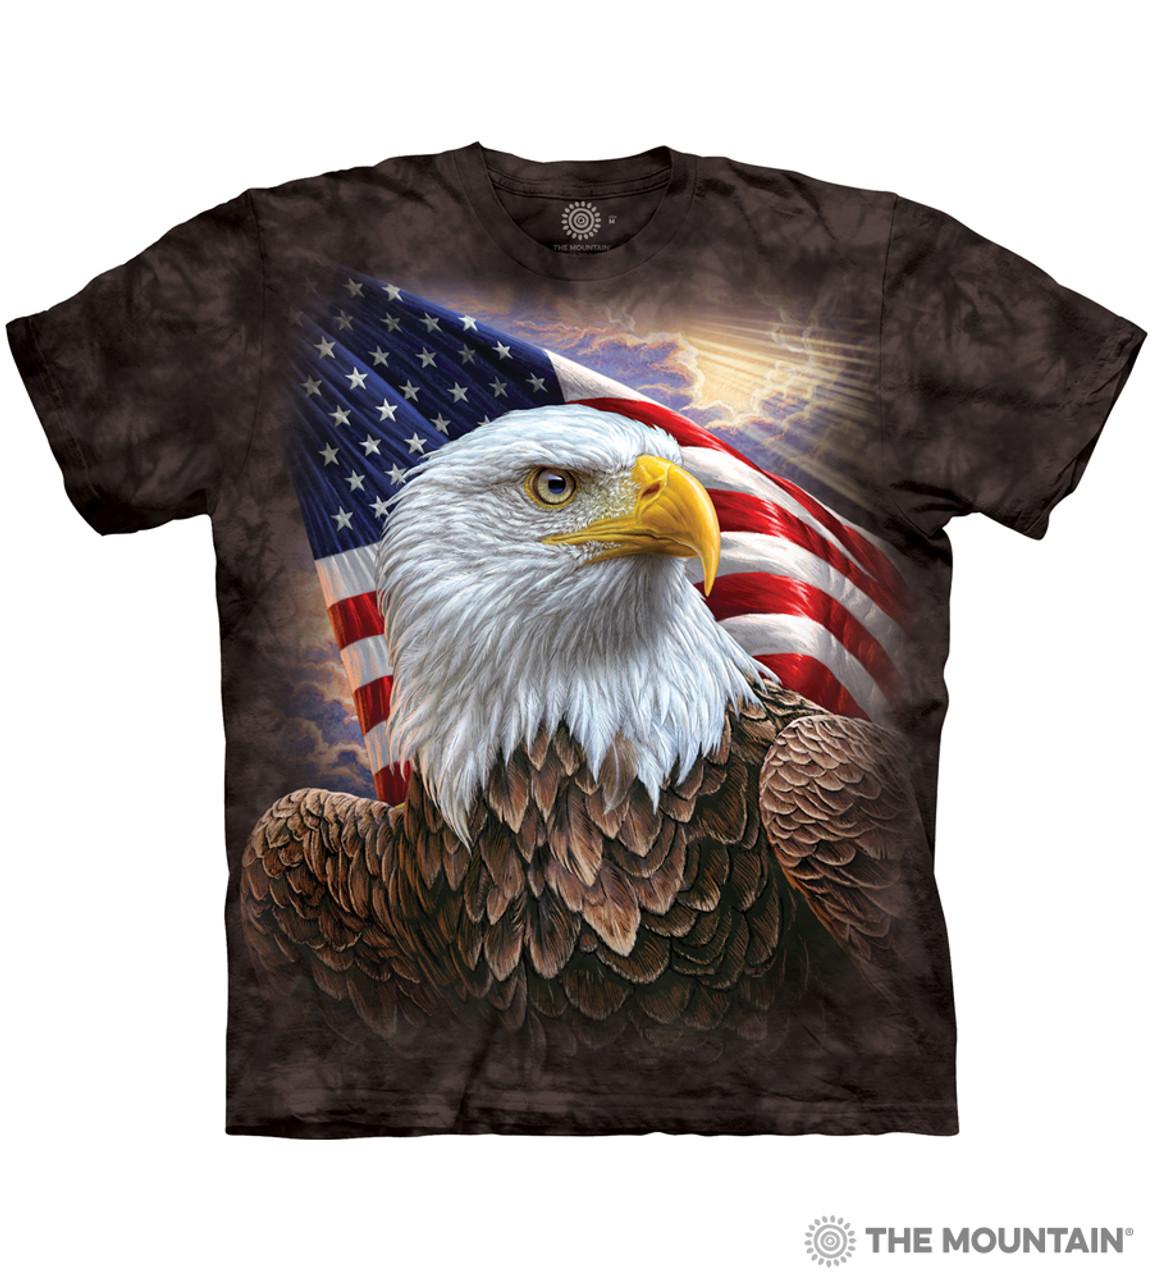 New The Mountain Bald Eagle Face T Shirt